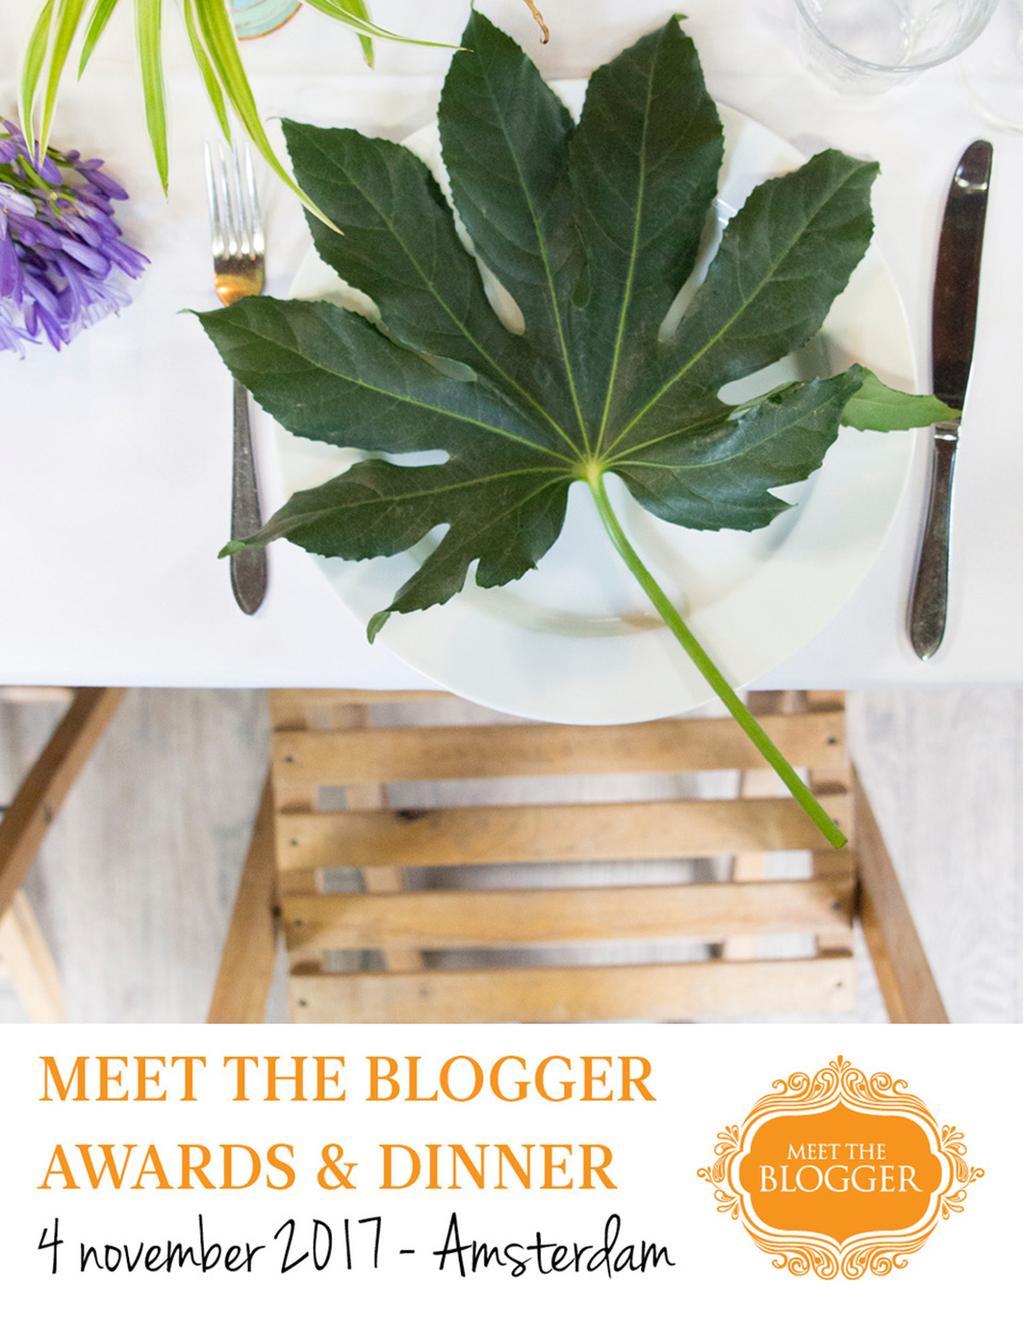 Meet the Blogger Awards